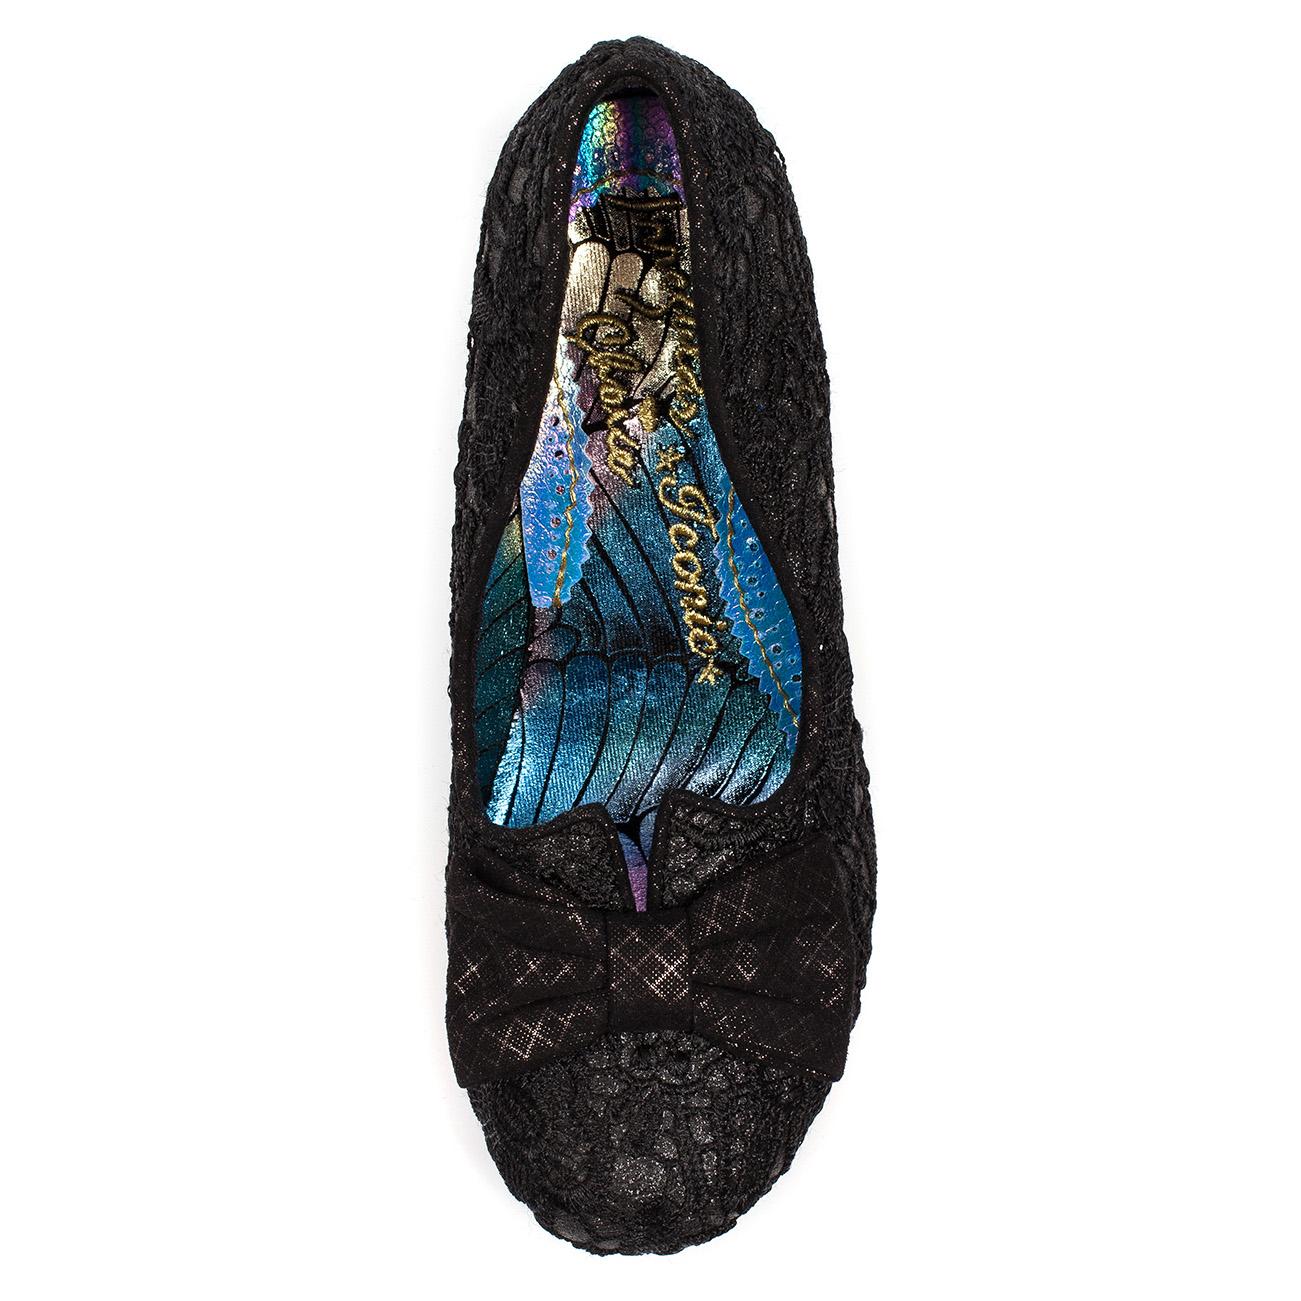 Donna Irregular Choice Choice Choice Dazzle Razzle Evening Low Heel Court scarpe US 5.5-11 4c62ac